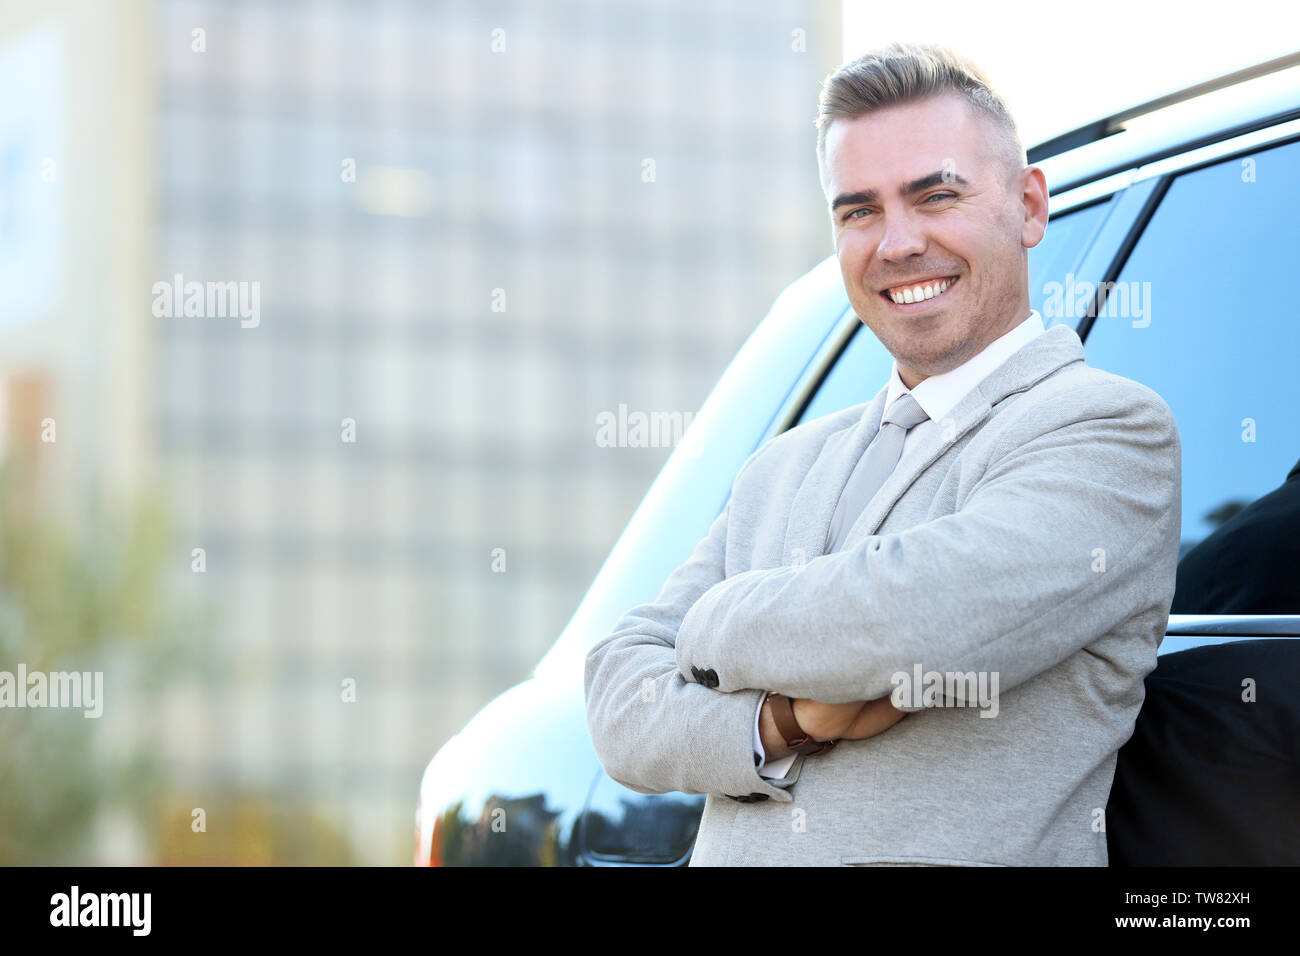 Man in formal wear standing near car on city street - Stock Image